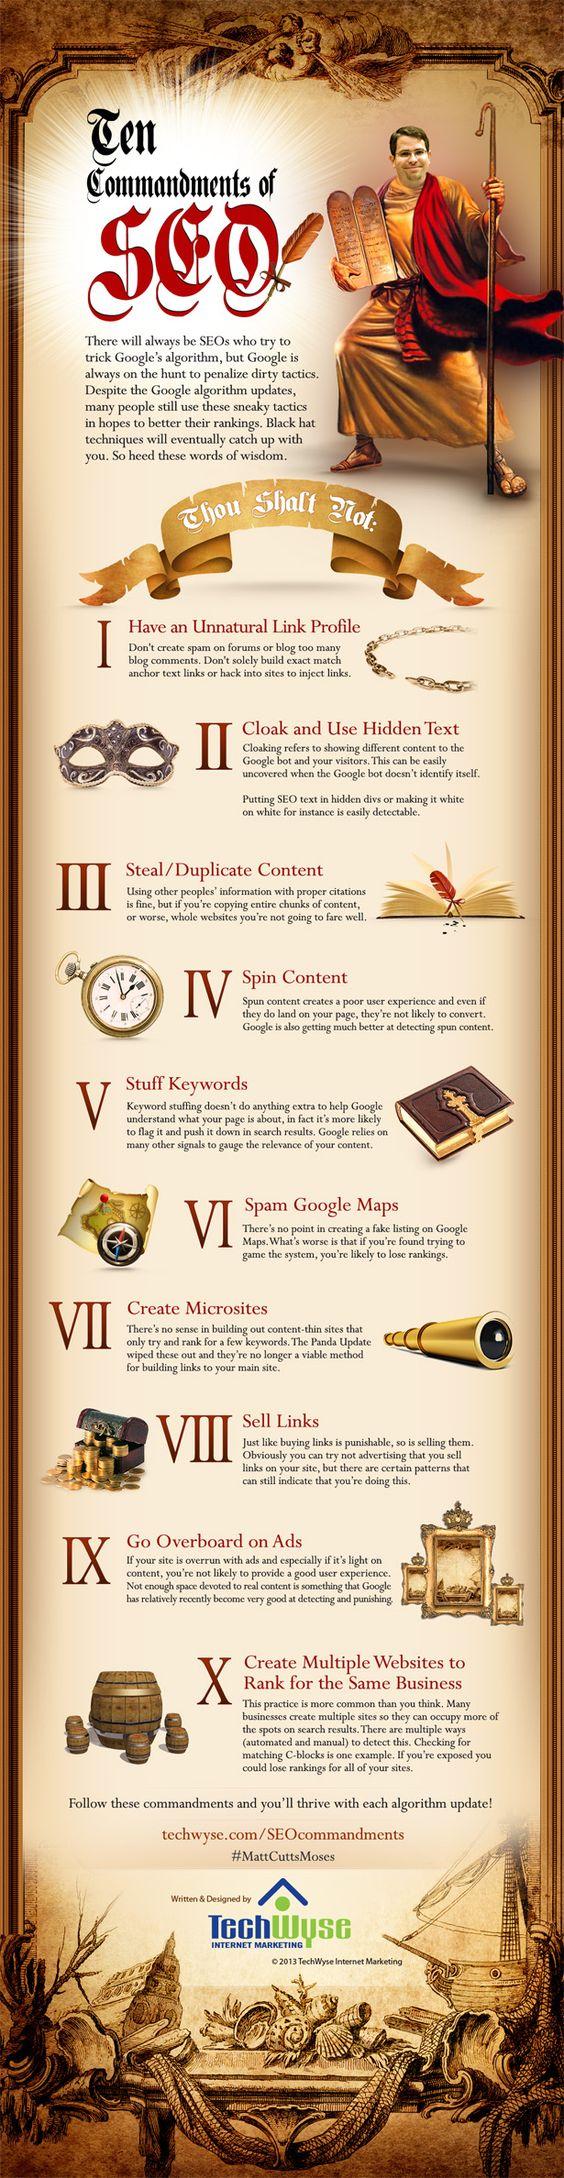 10 Commandements du SEO